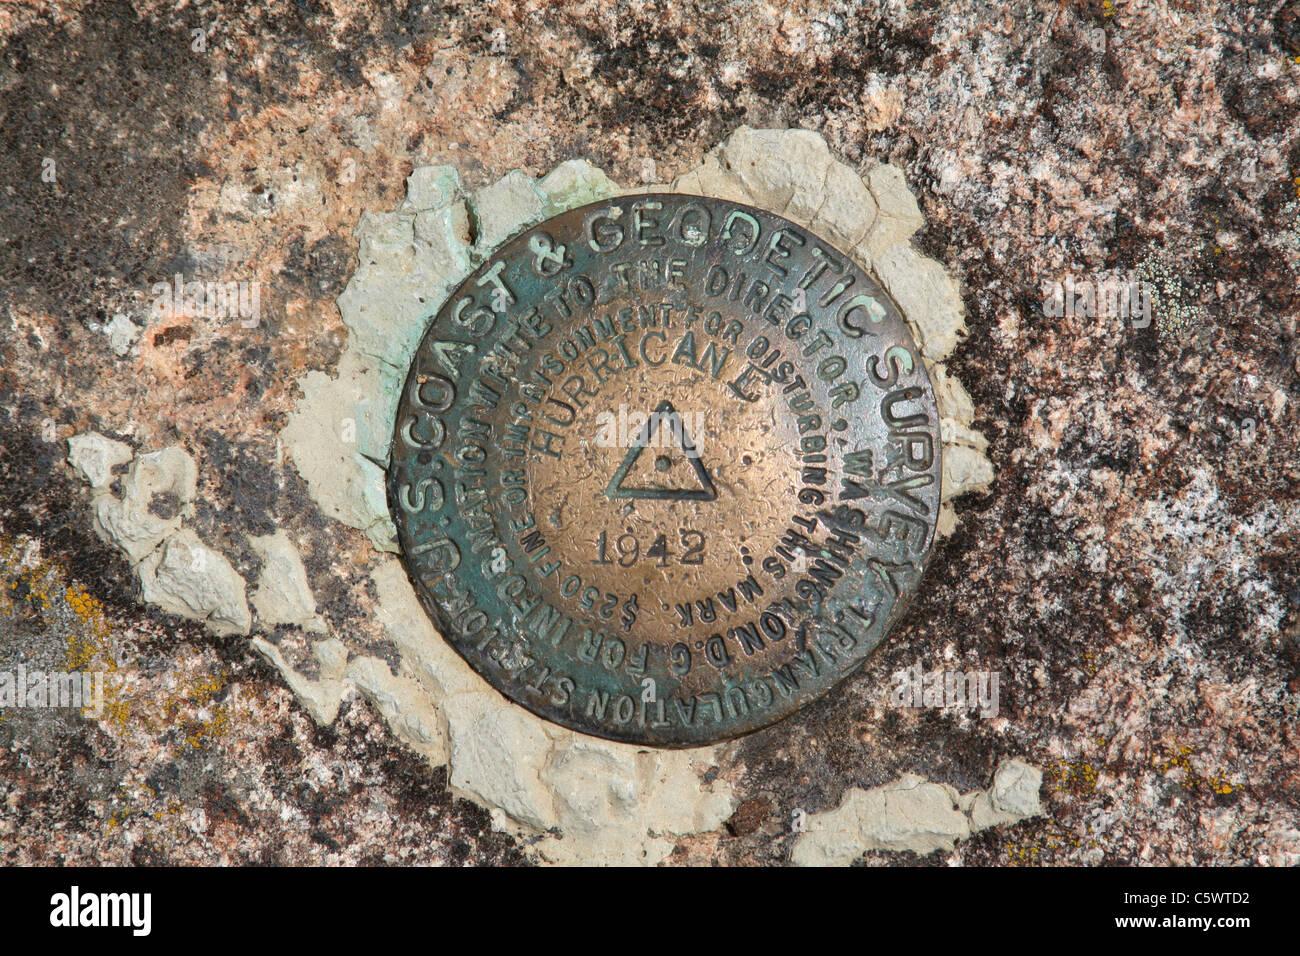 US Coast and Geodetic Survey Triangulation Station Mountaintop Benchmark, Hurricane Mountain in the Adirondacks, - Stock Image